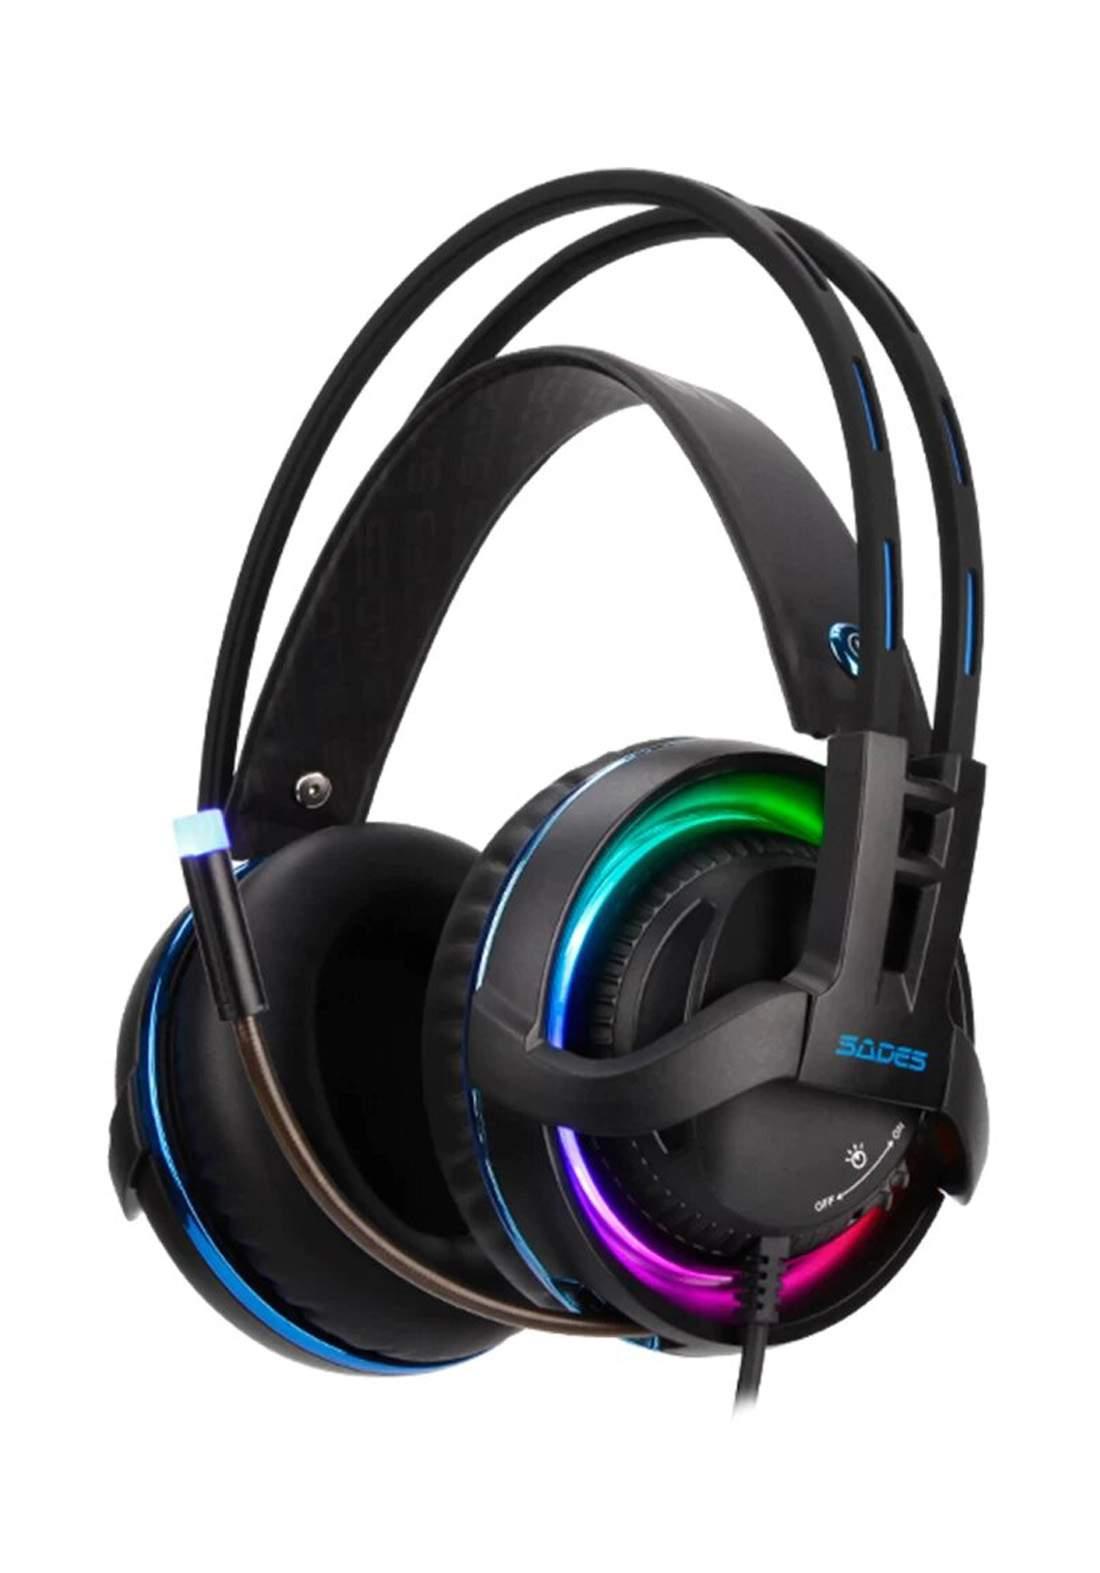 Sades Diablo Wired Gaming Headset - Black سماعة سلكية